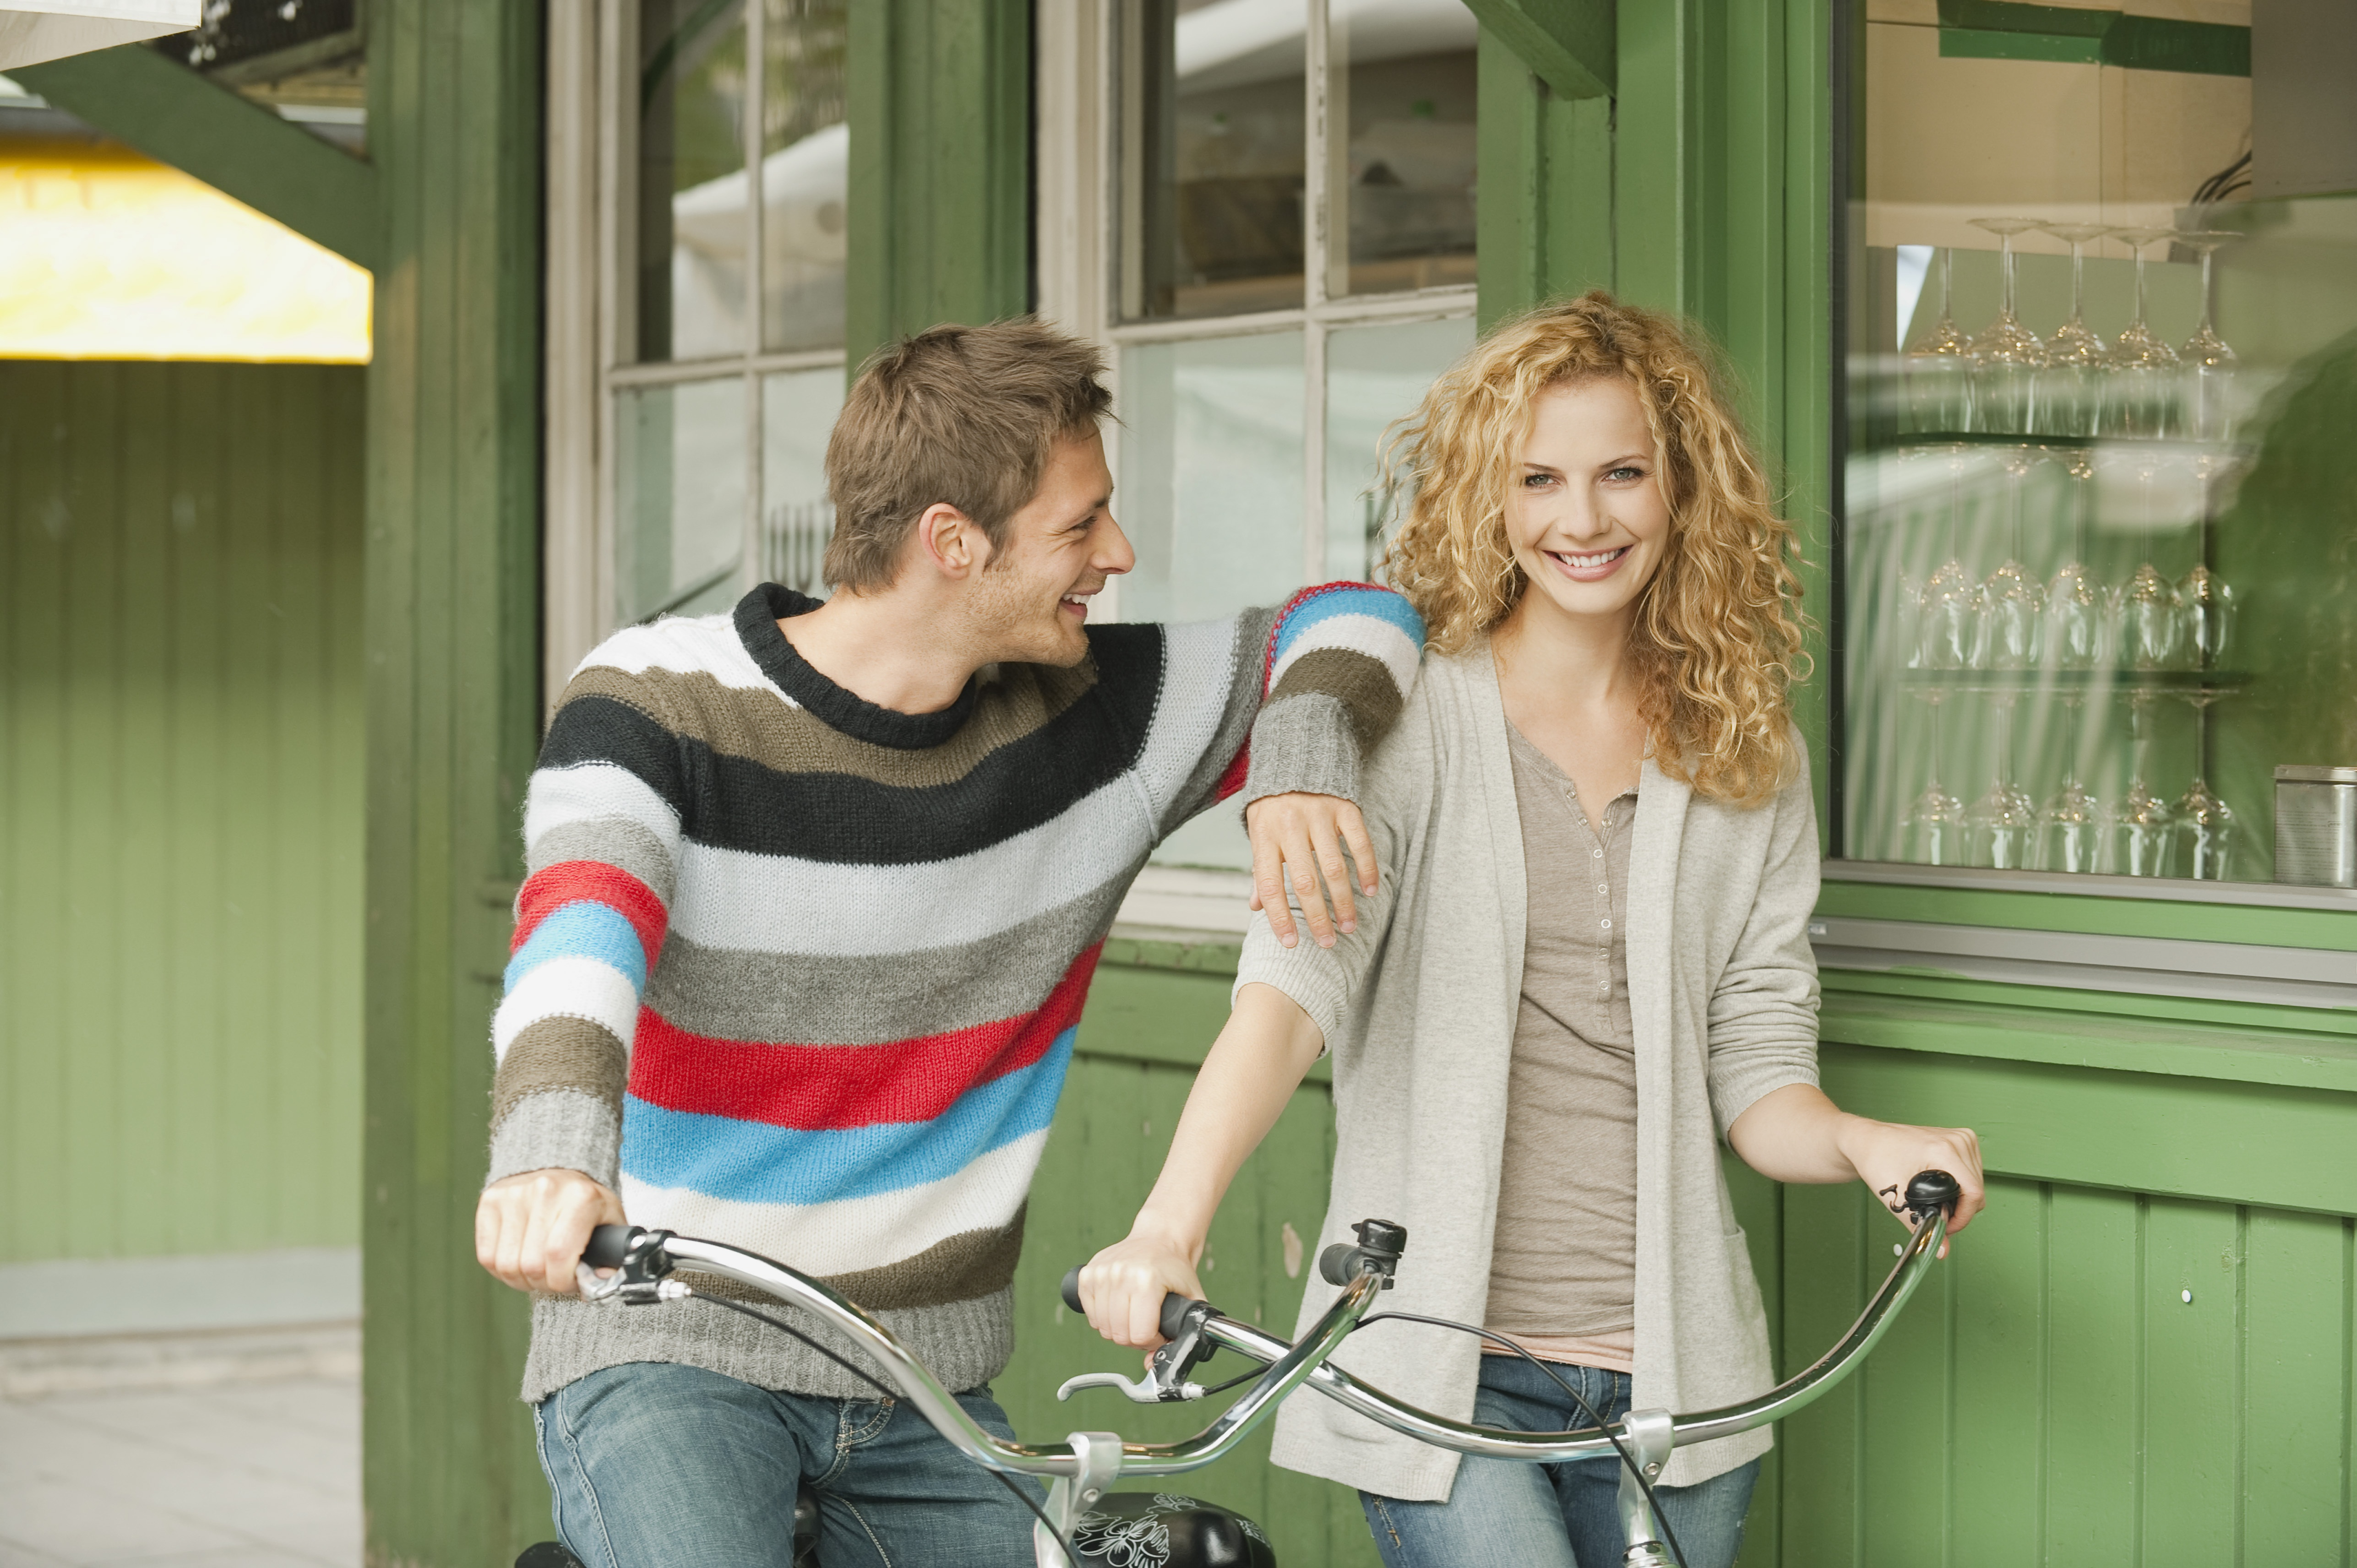 romance_couple_biking_shutterstock.jpg